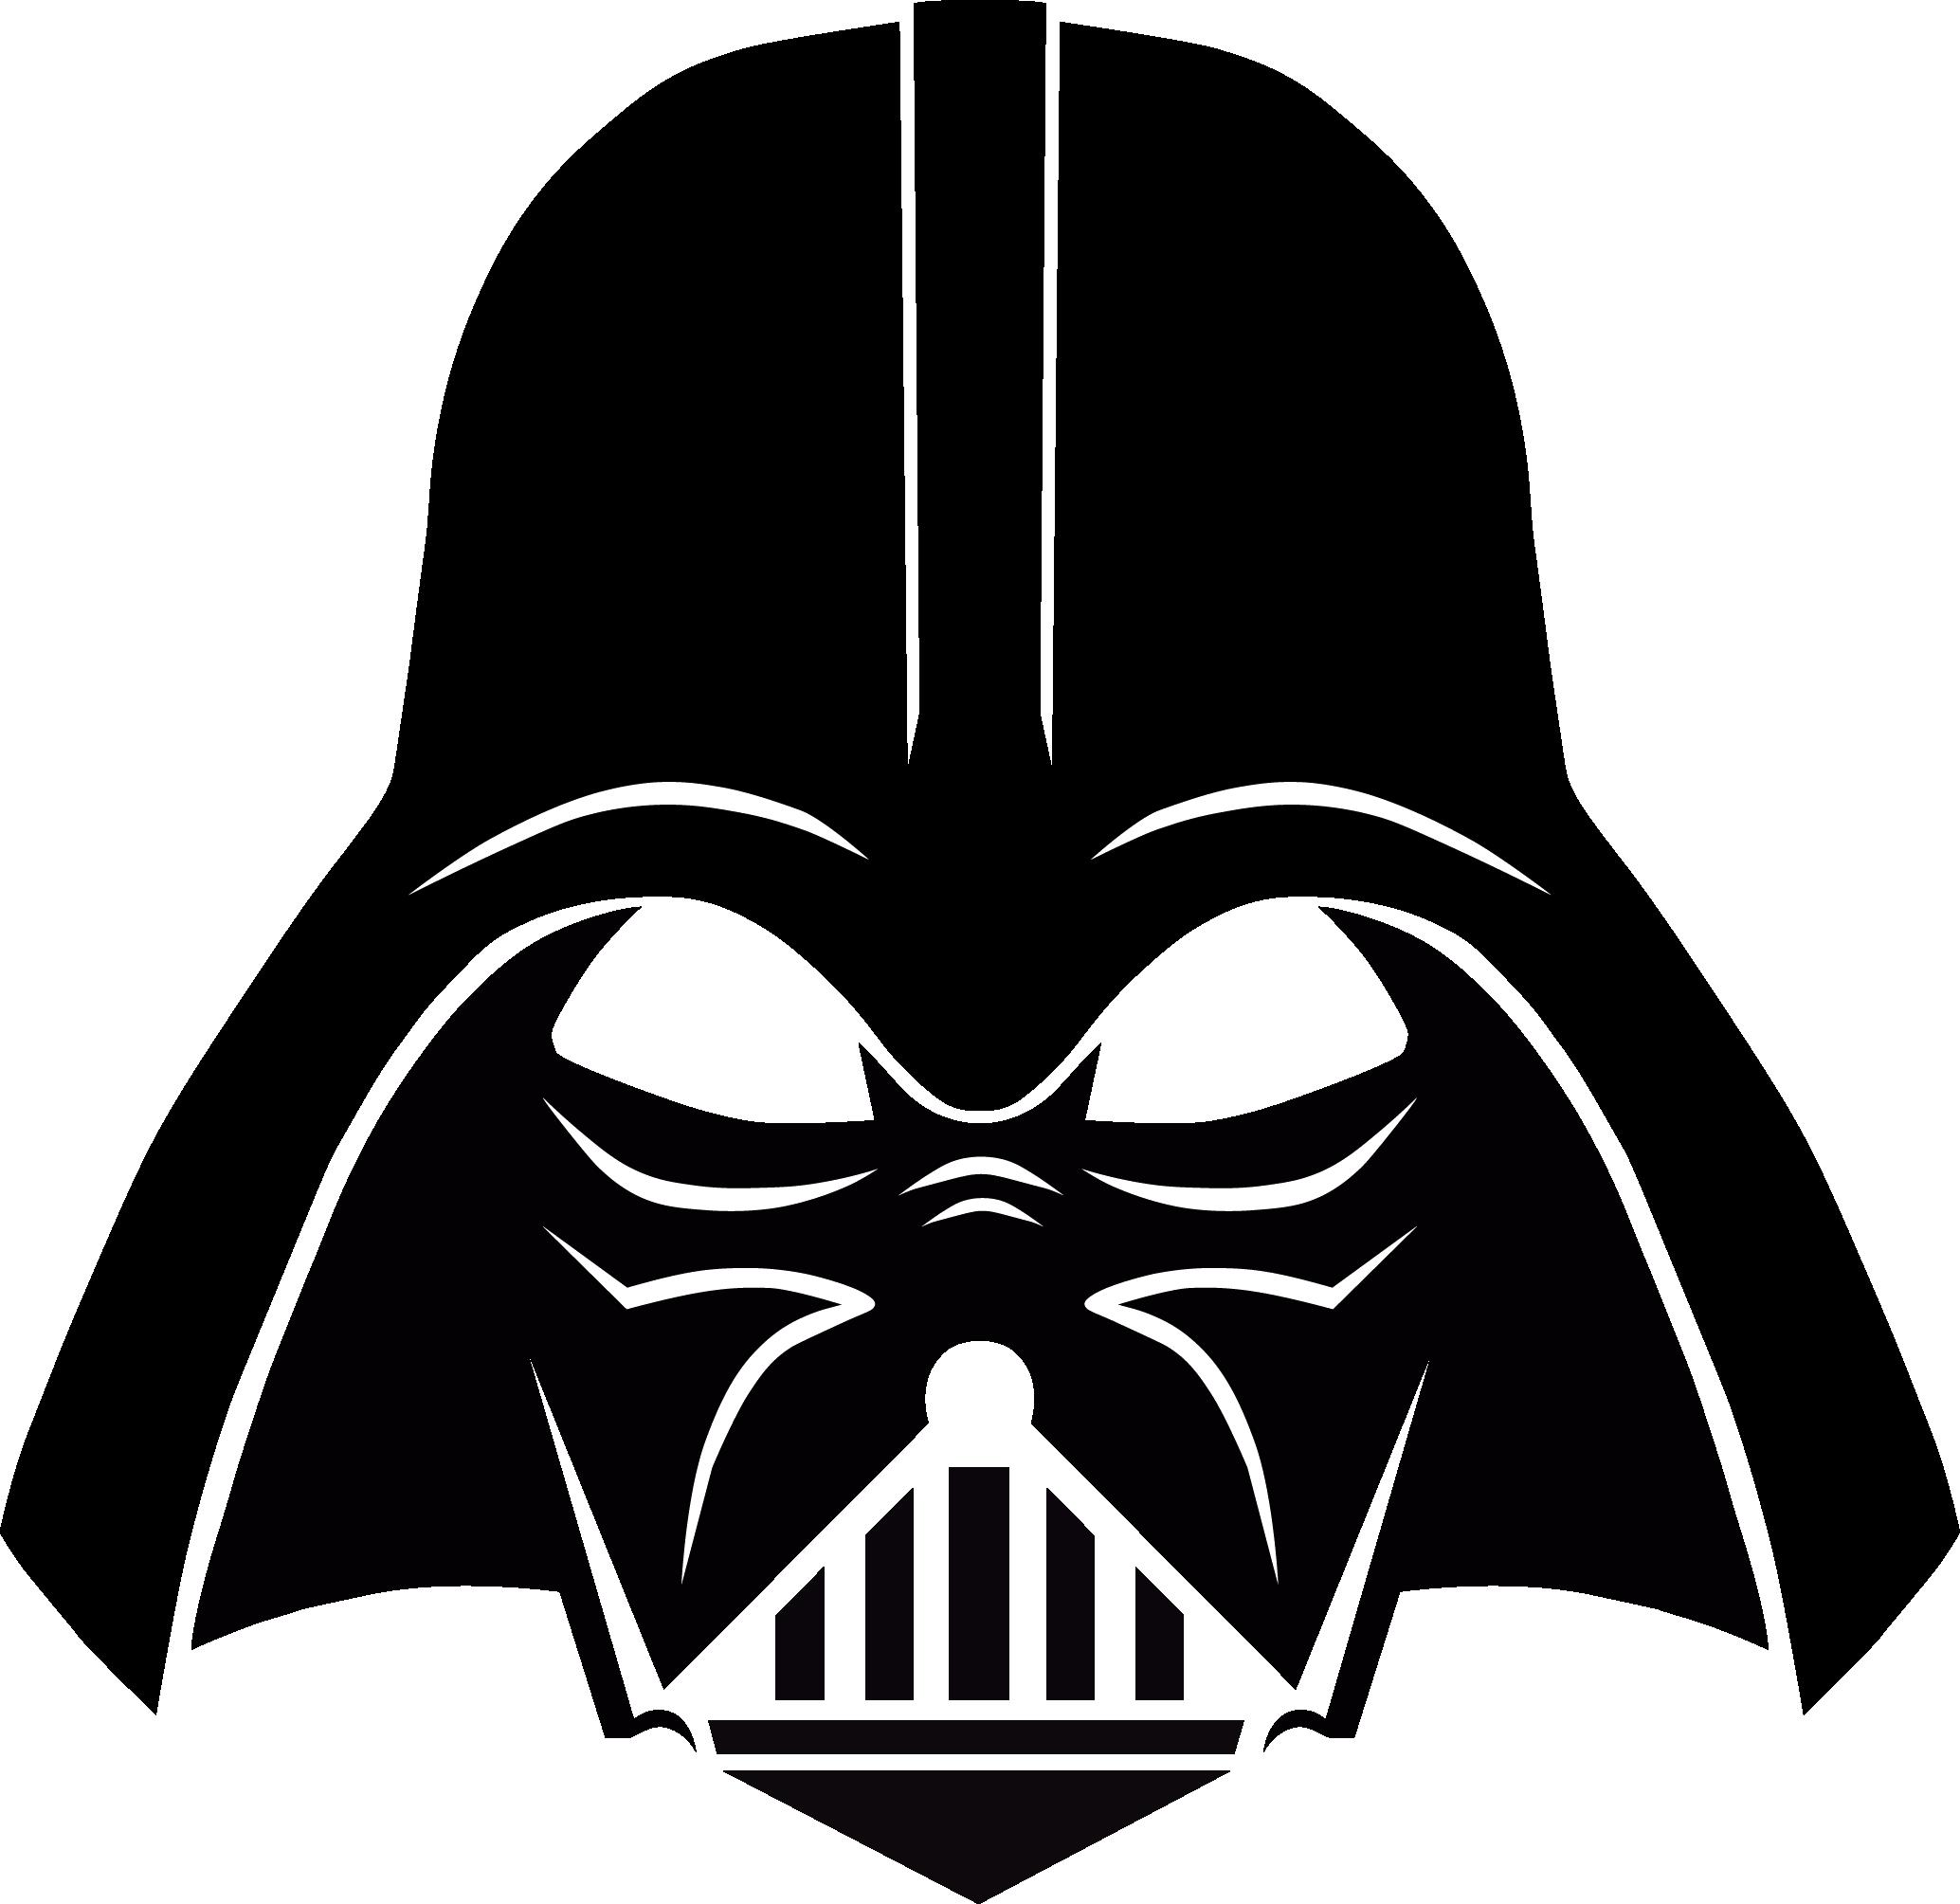 2068x2009 Darth Vader Stencil, Free Download Star Wars Darth